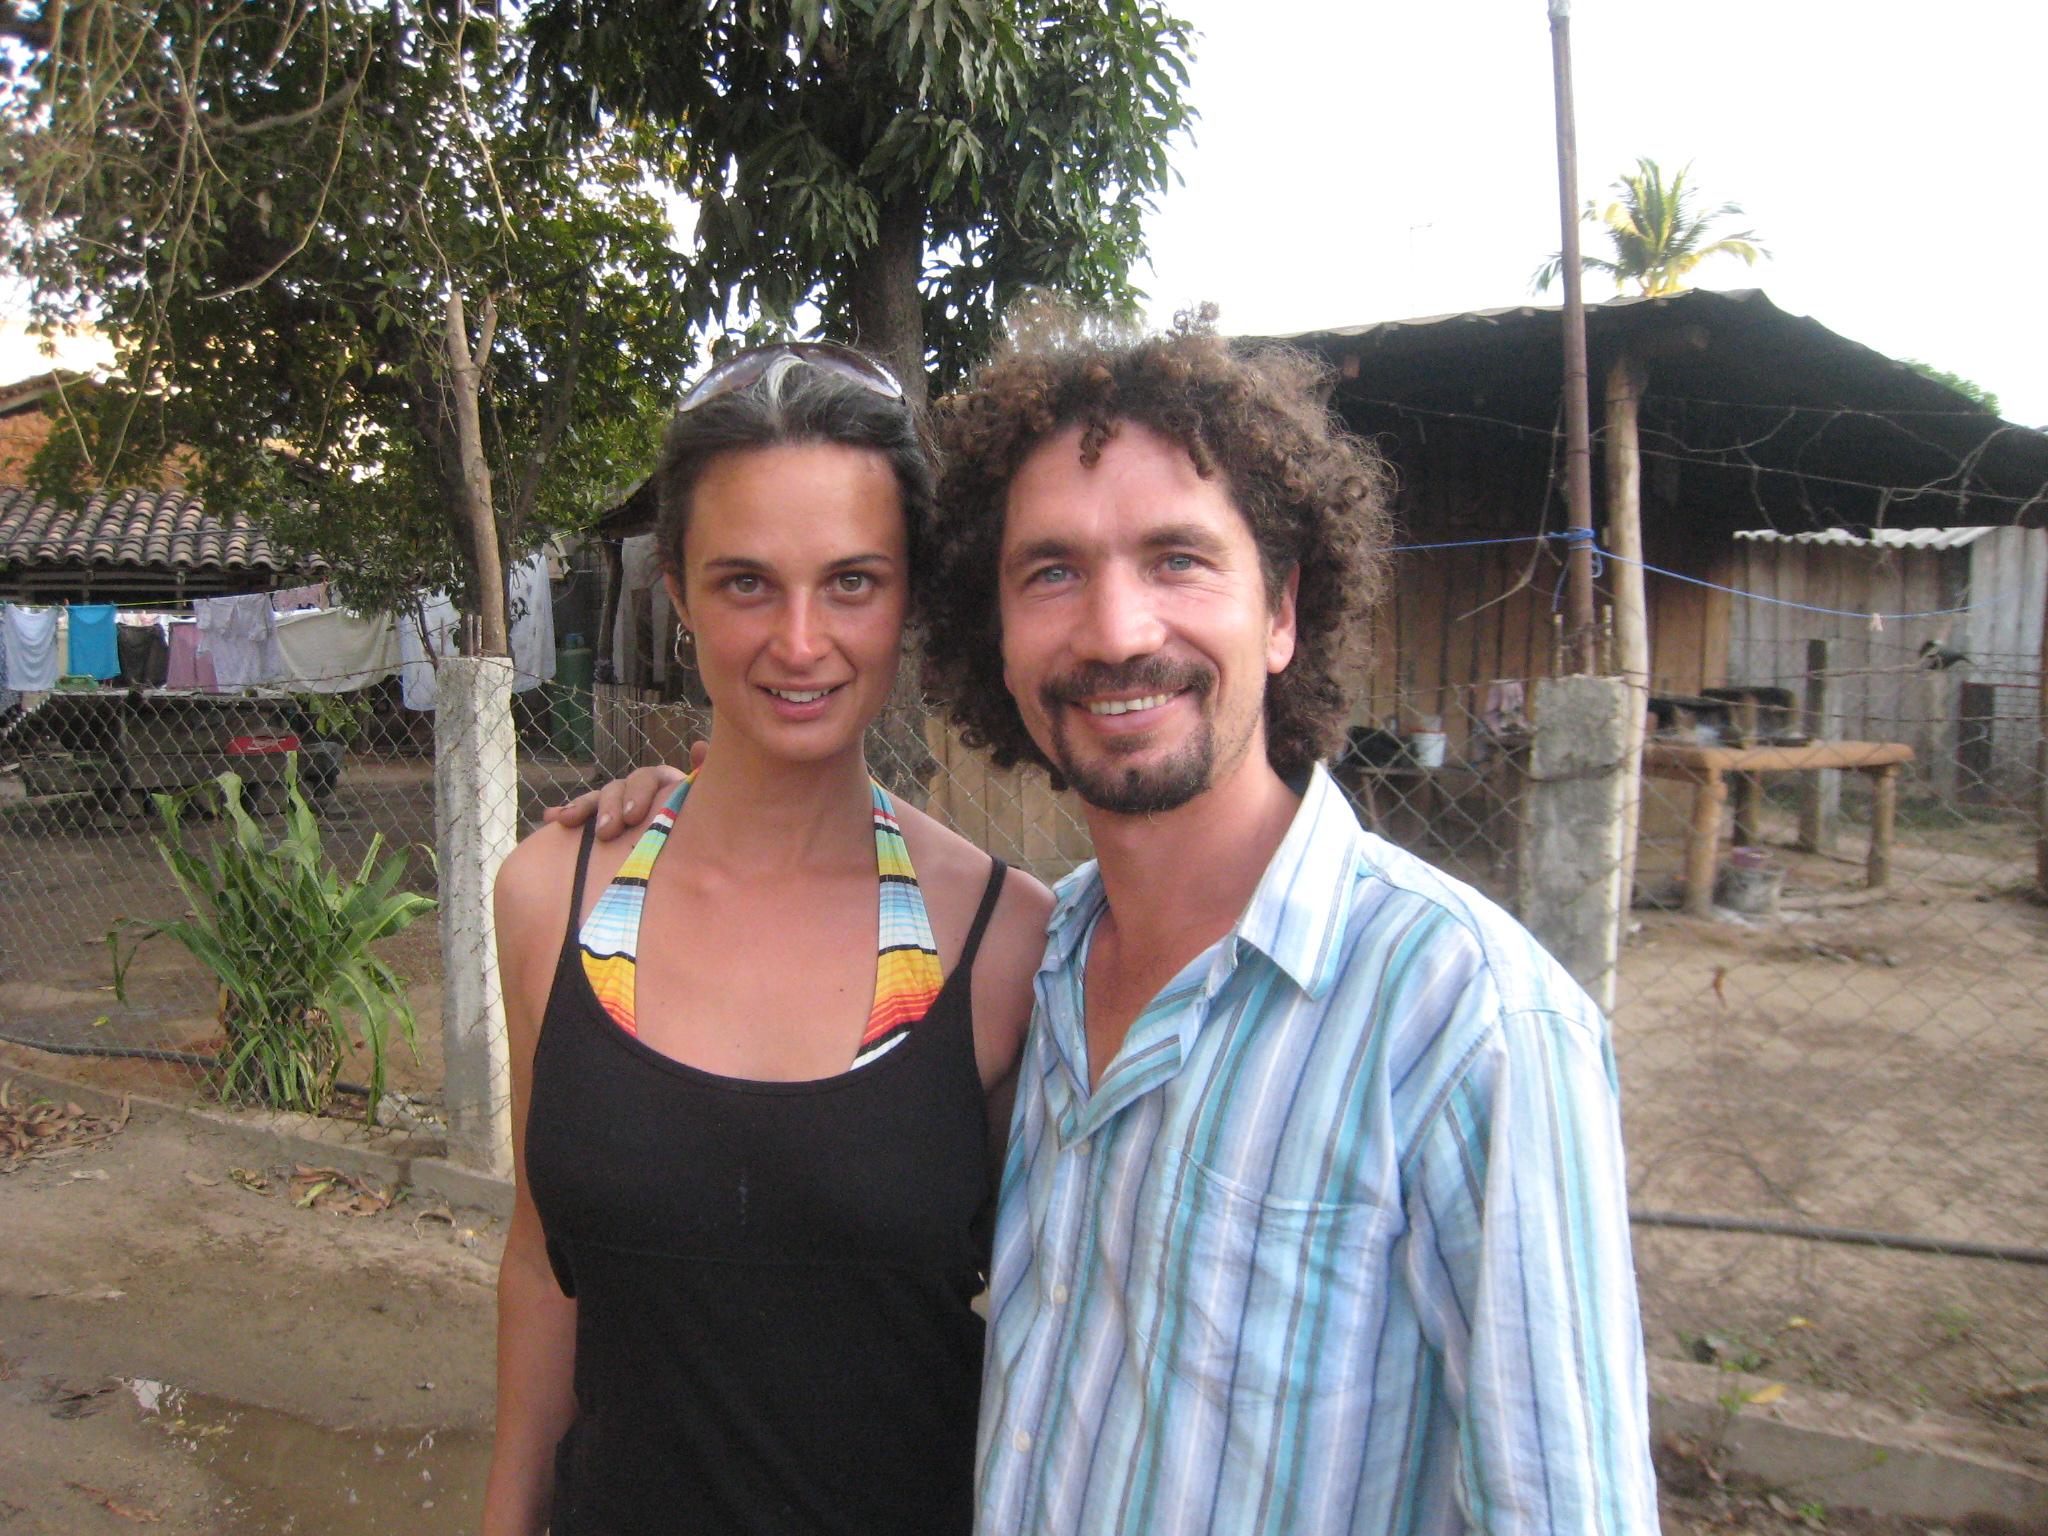 Julia with Odin at Playa Viva